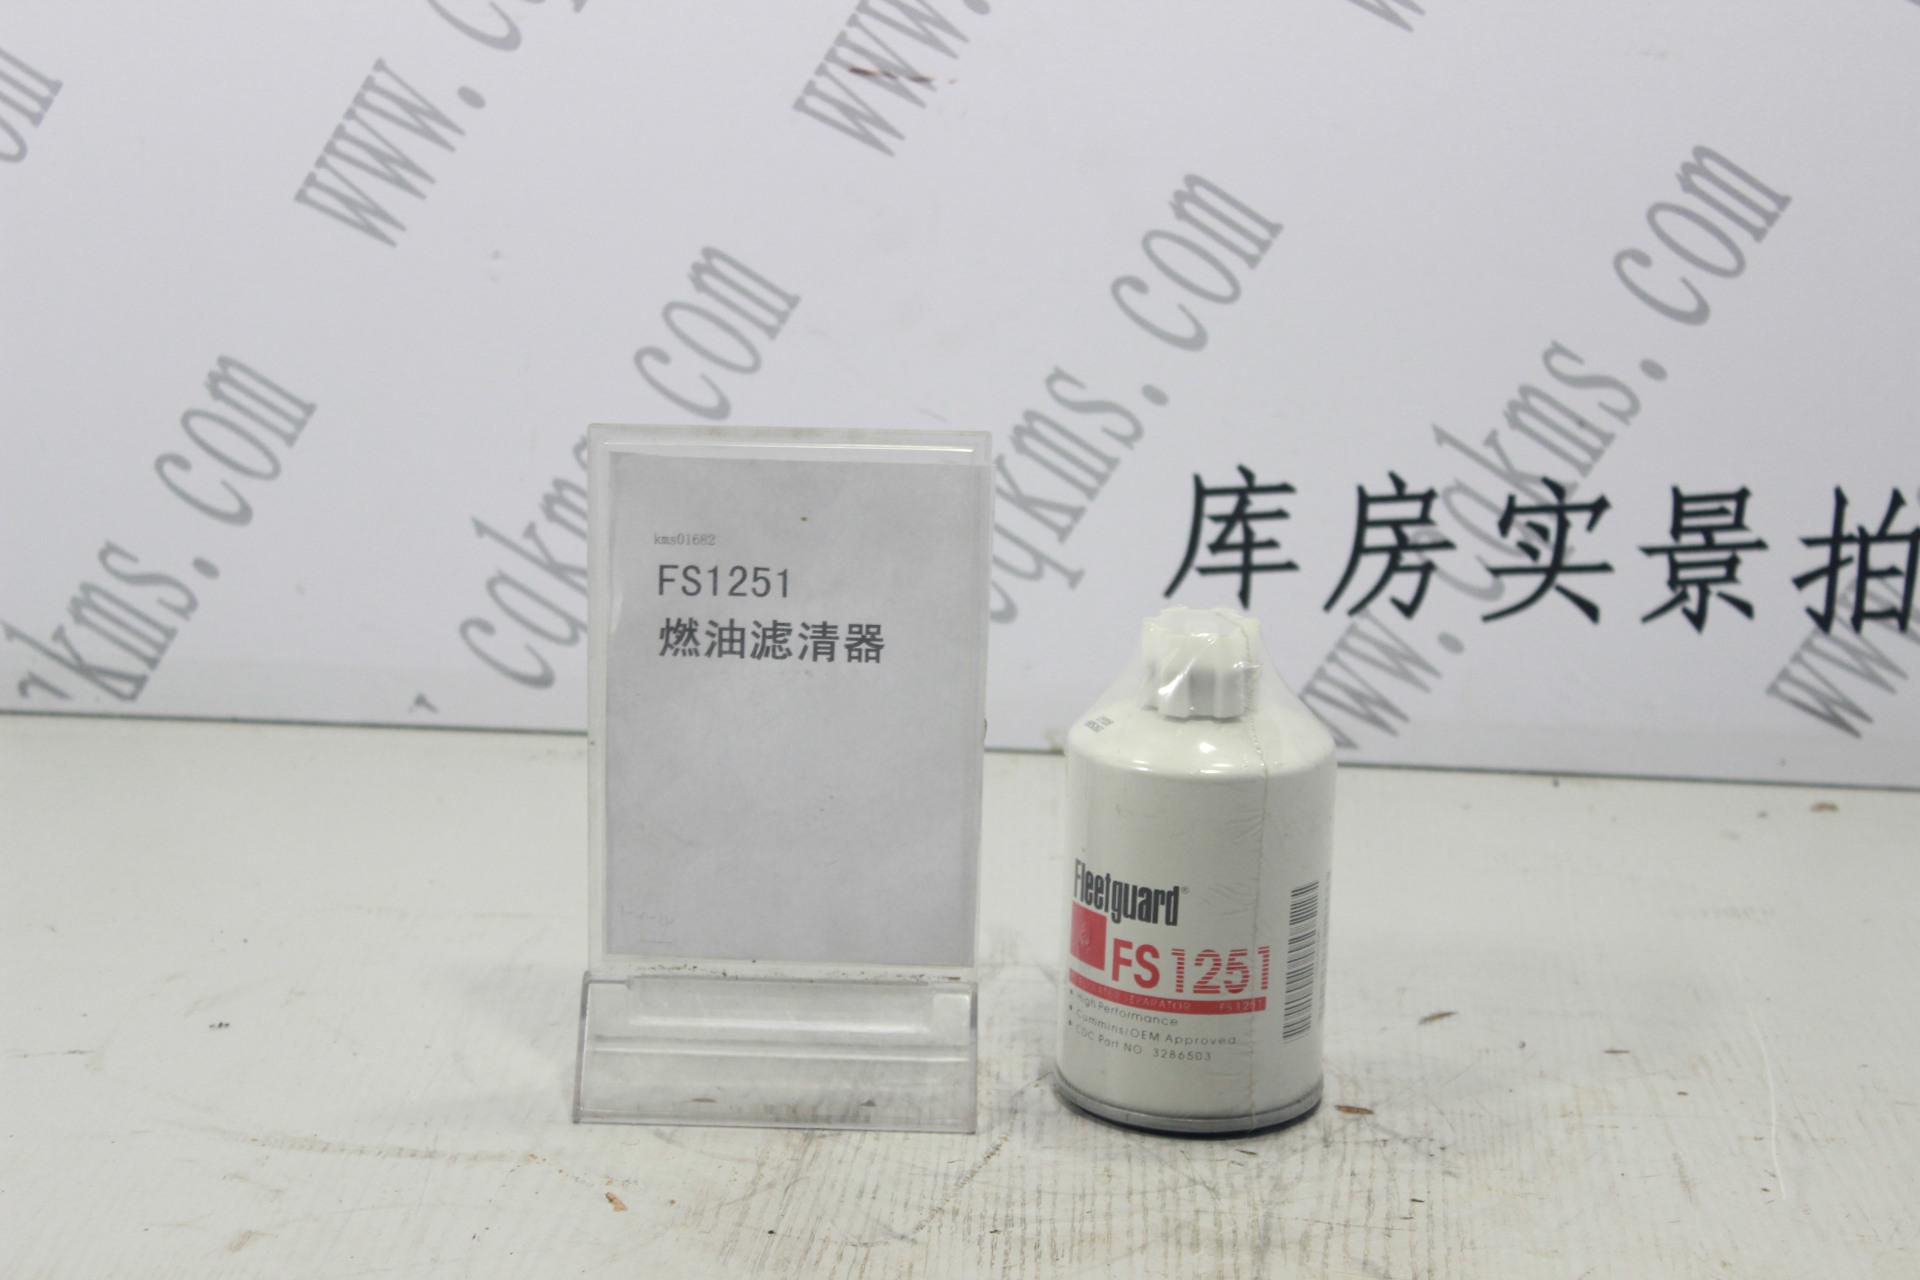 kms01682-FS1251-燃油滤清器----参考重量450-450图片2